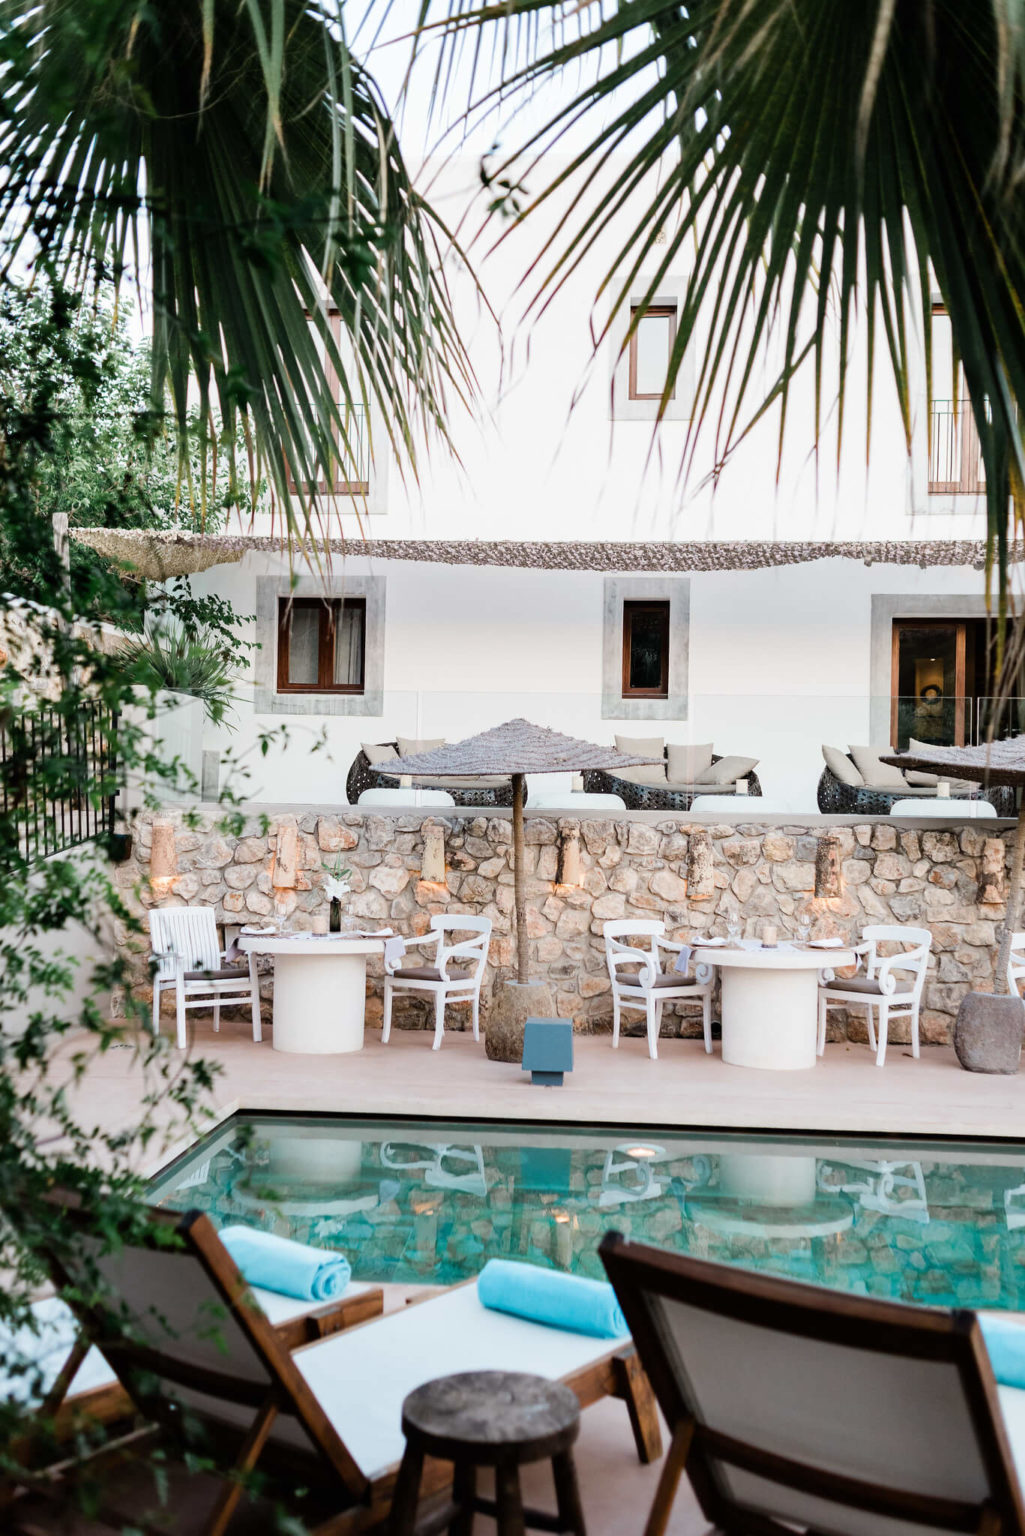 https://www.white-ibiza.com/wp-content/uploads/2020/03/white-ibiza-boutique-hotels-the-giri-residence-2020-07-1025x1536.jpg